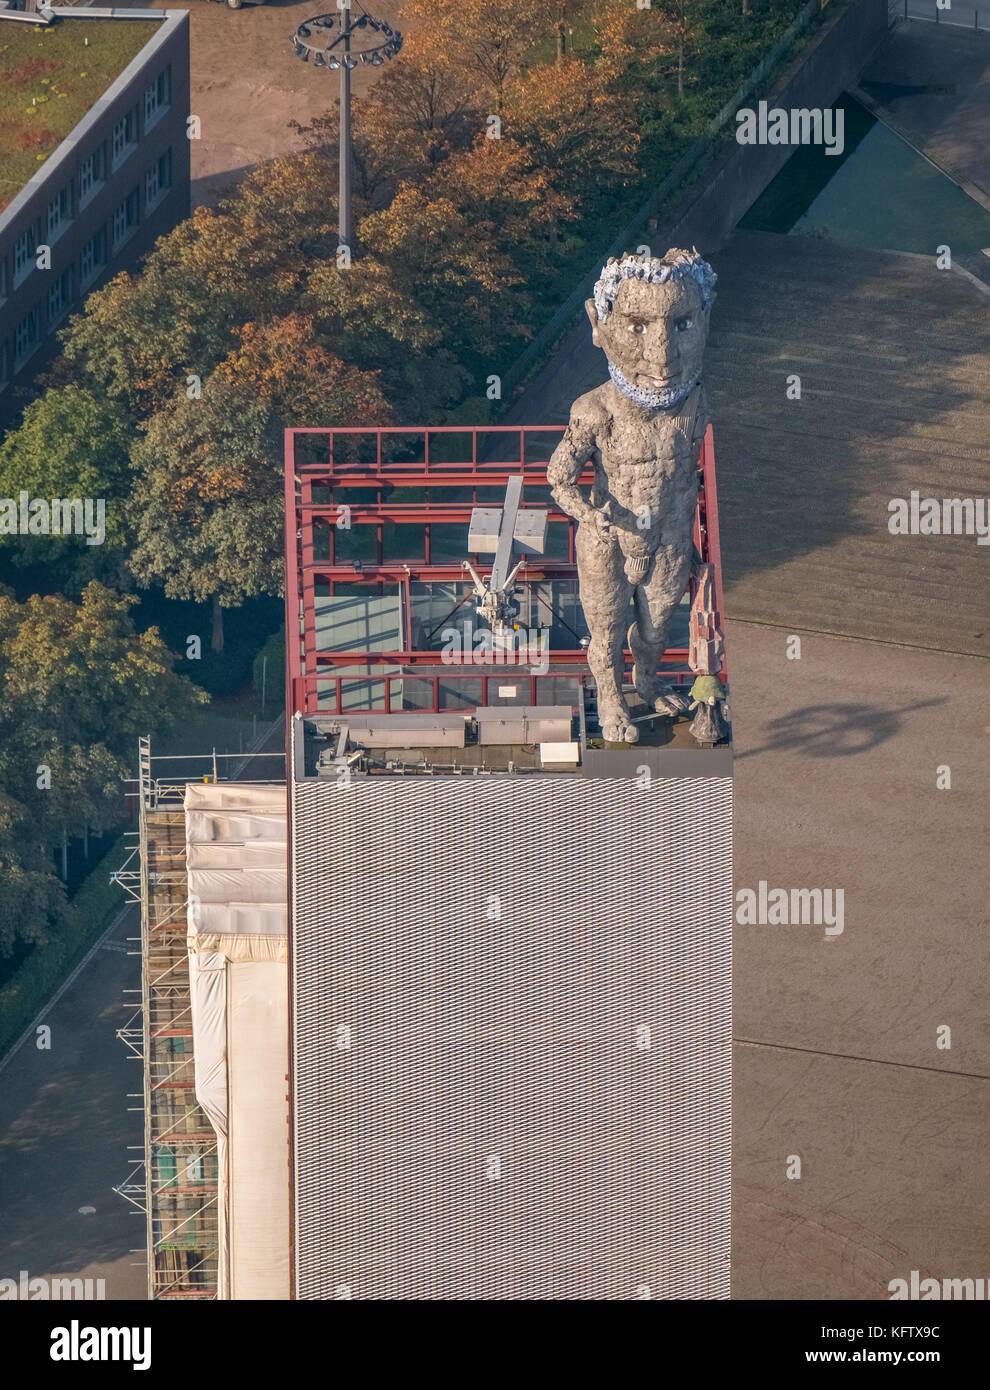 Hercules of Gelsenkirchen is a monumental statue, Markus Lüpertz, Vivawest Wohnen GmbH, Nordsternpark, former - Stock Image